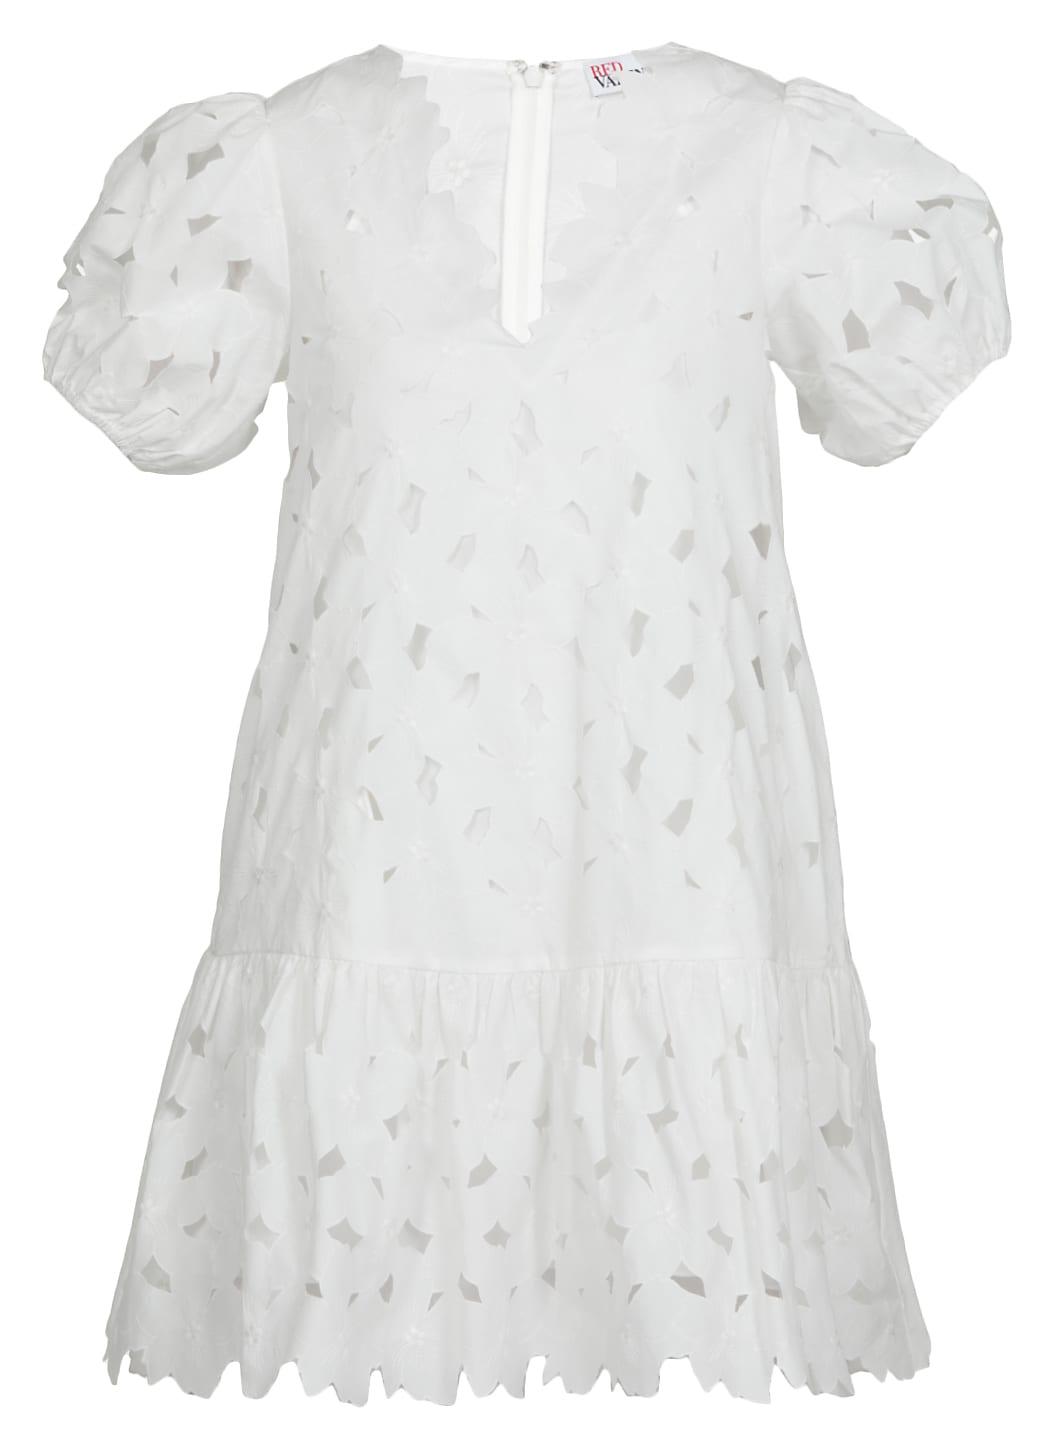 RED Valentino Cotton Poplin Dress